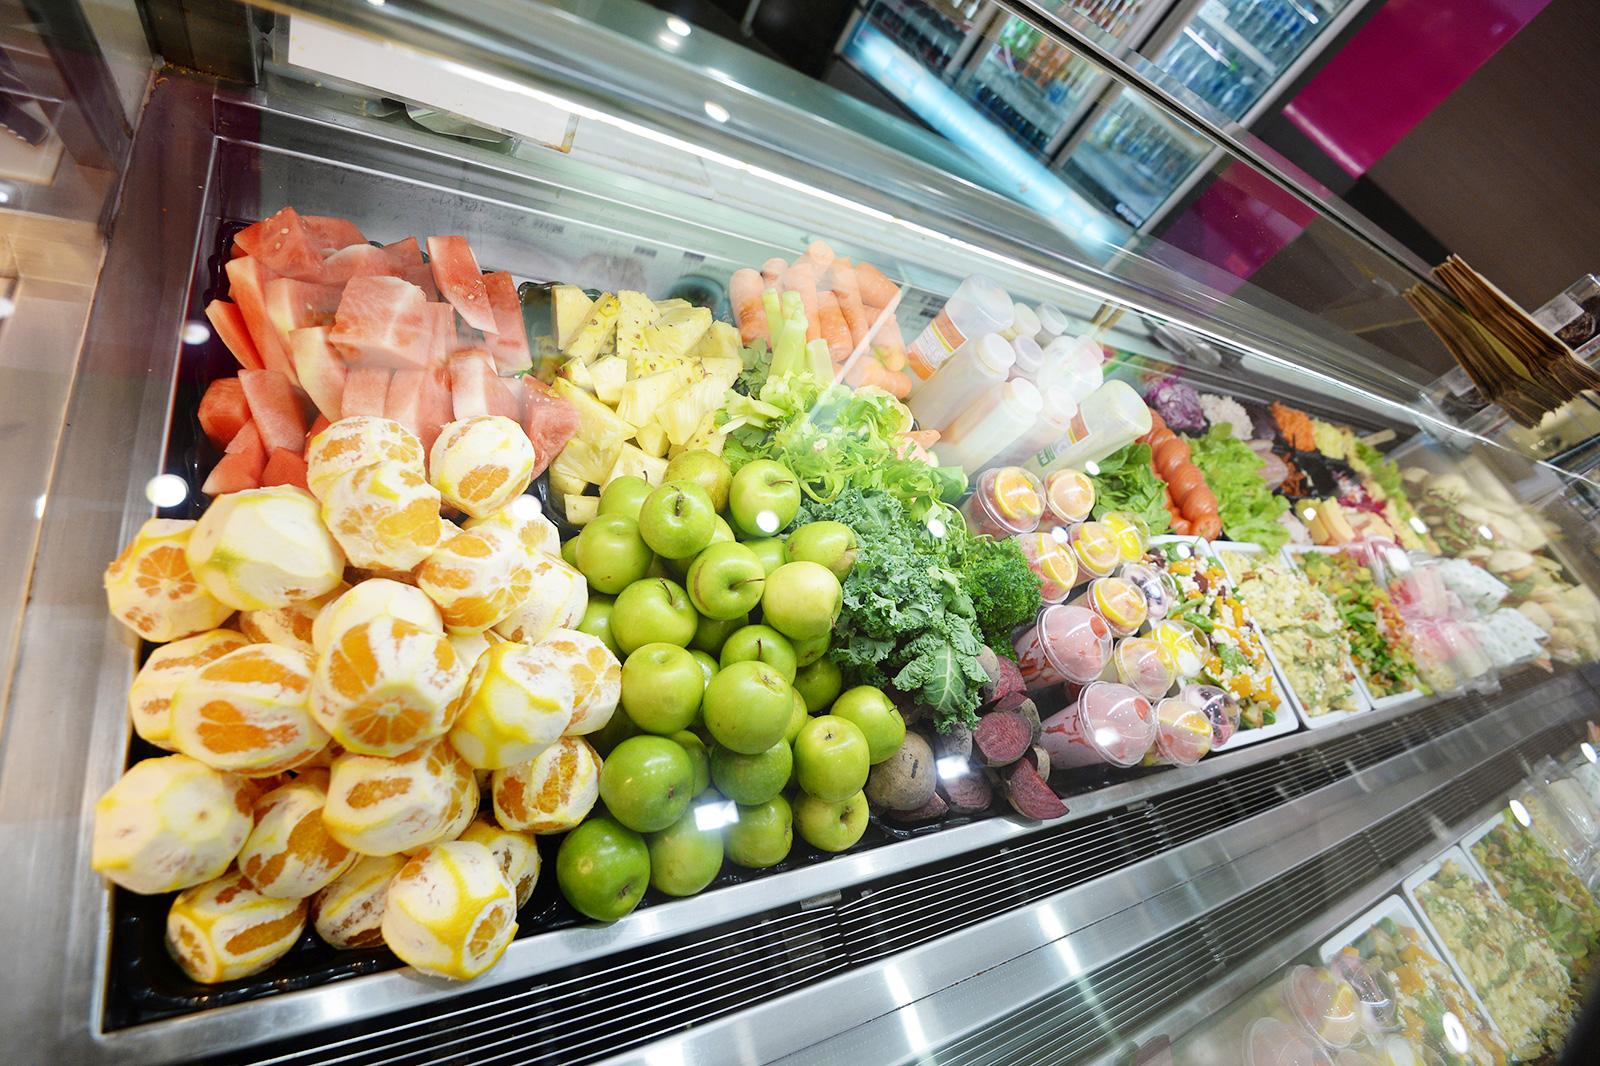 take-a-way-sandwich-shop-healthy-habits-grafton-shopping-world-reduced-price-3